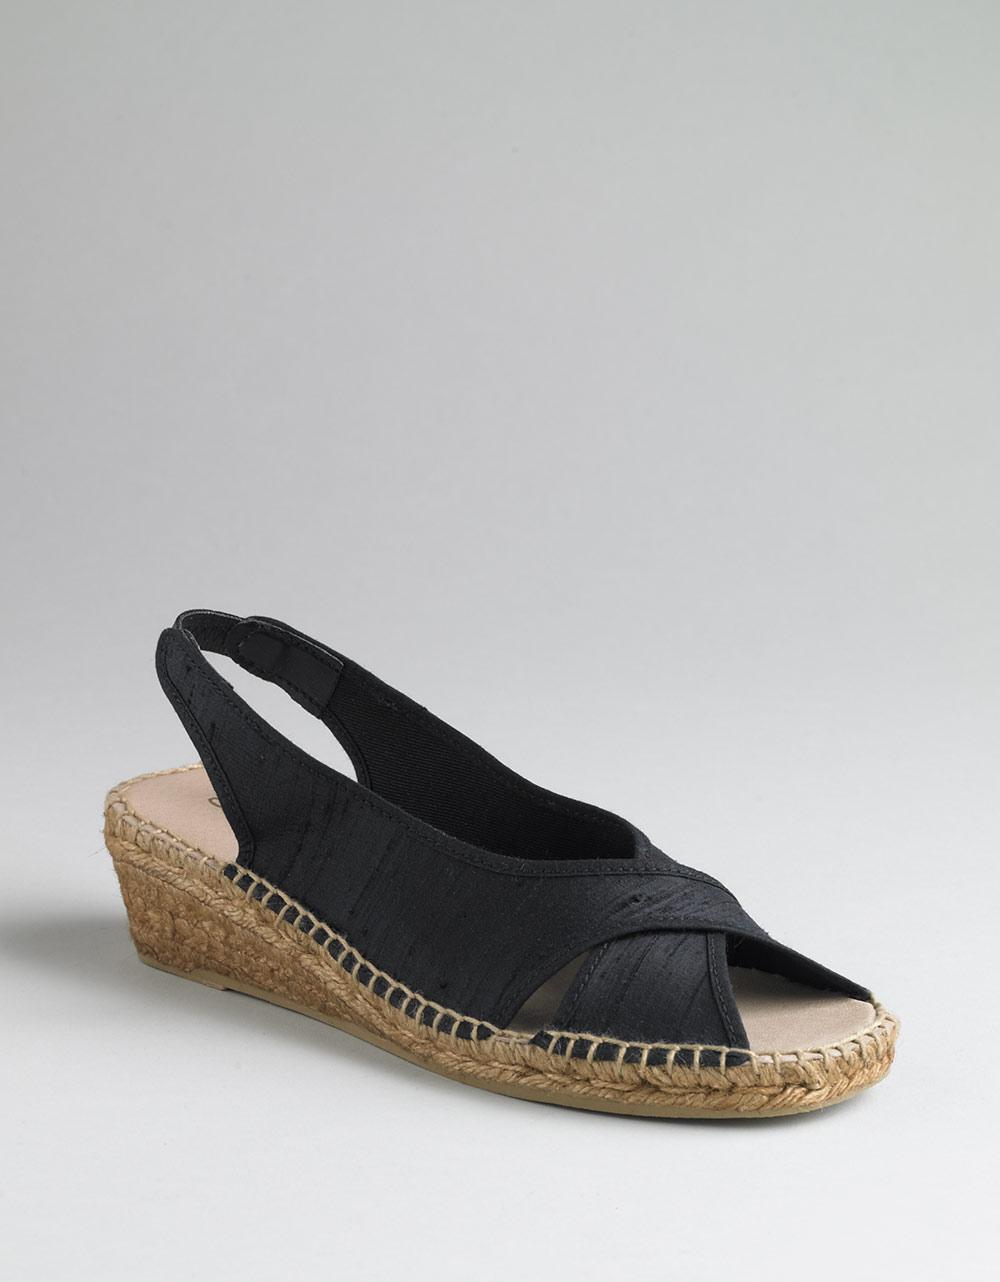 andre assous dodie linen espadrille platform wedge sandals